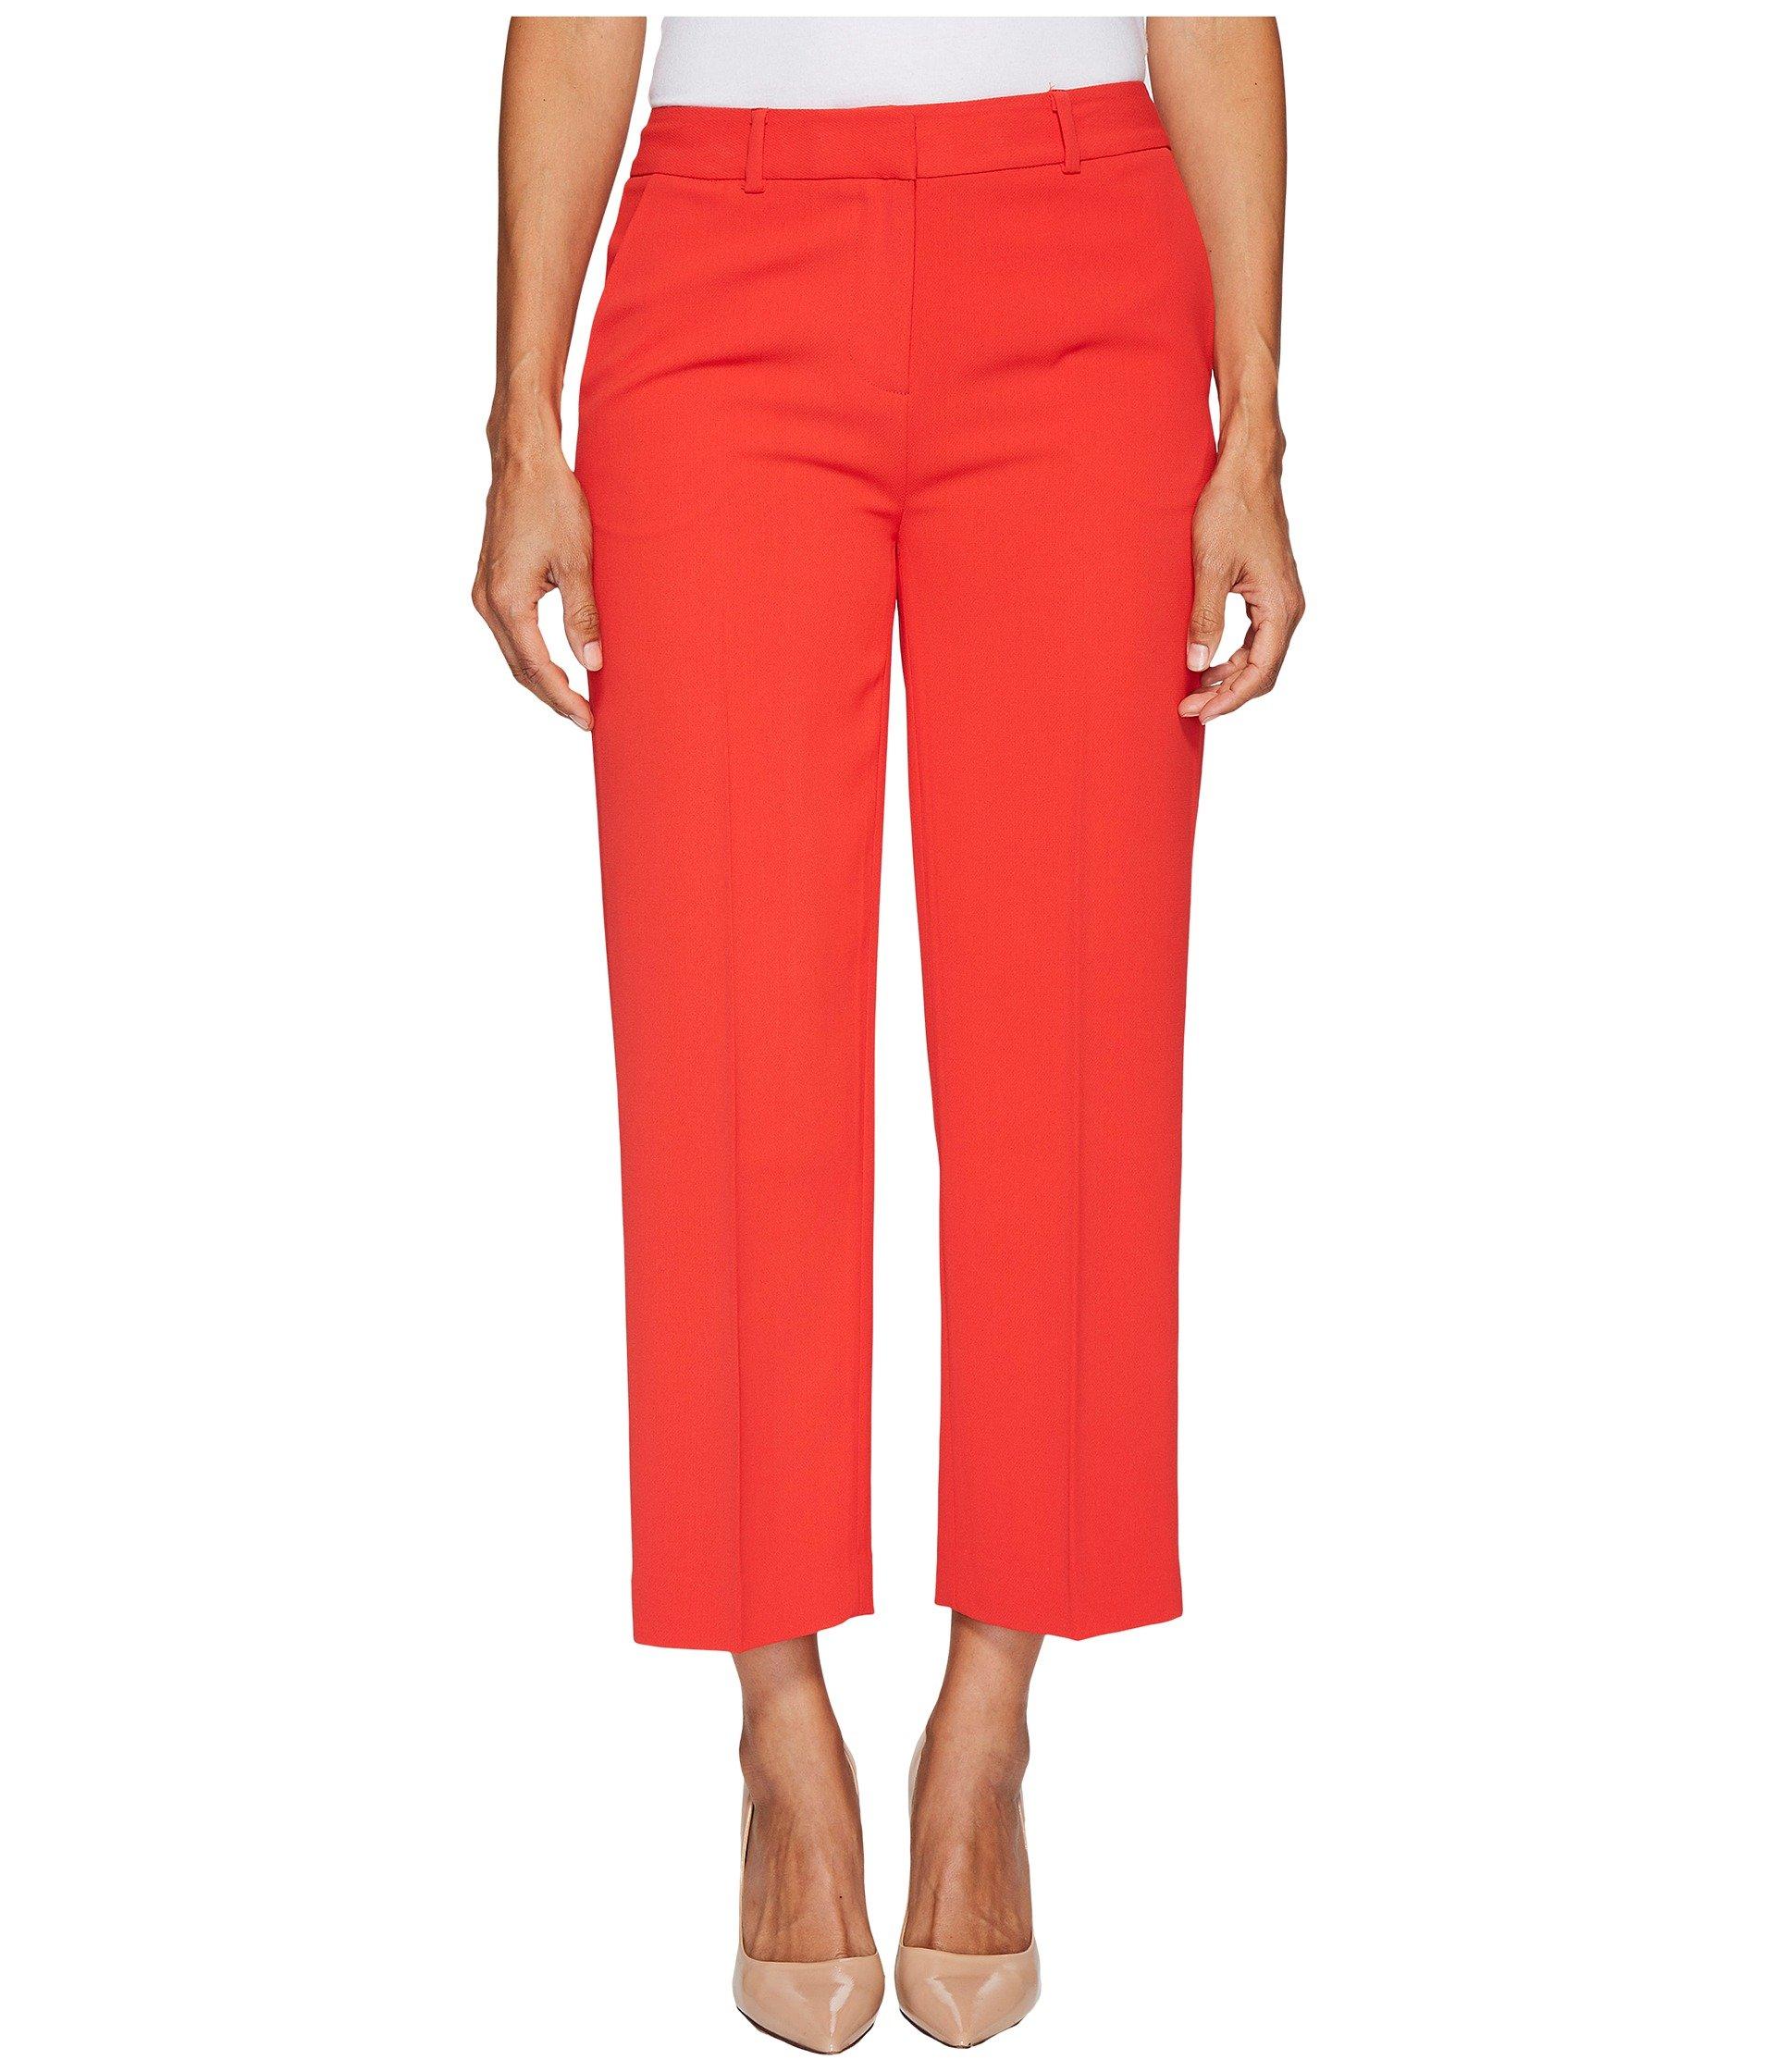 Pantalón para Mujer Vince Camuto Specialty Size Petite Texture Base Straight Leg Crop Pants  + Vince Camuto en VeoyCompro.net